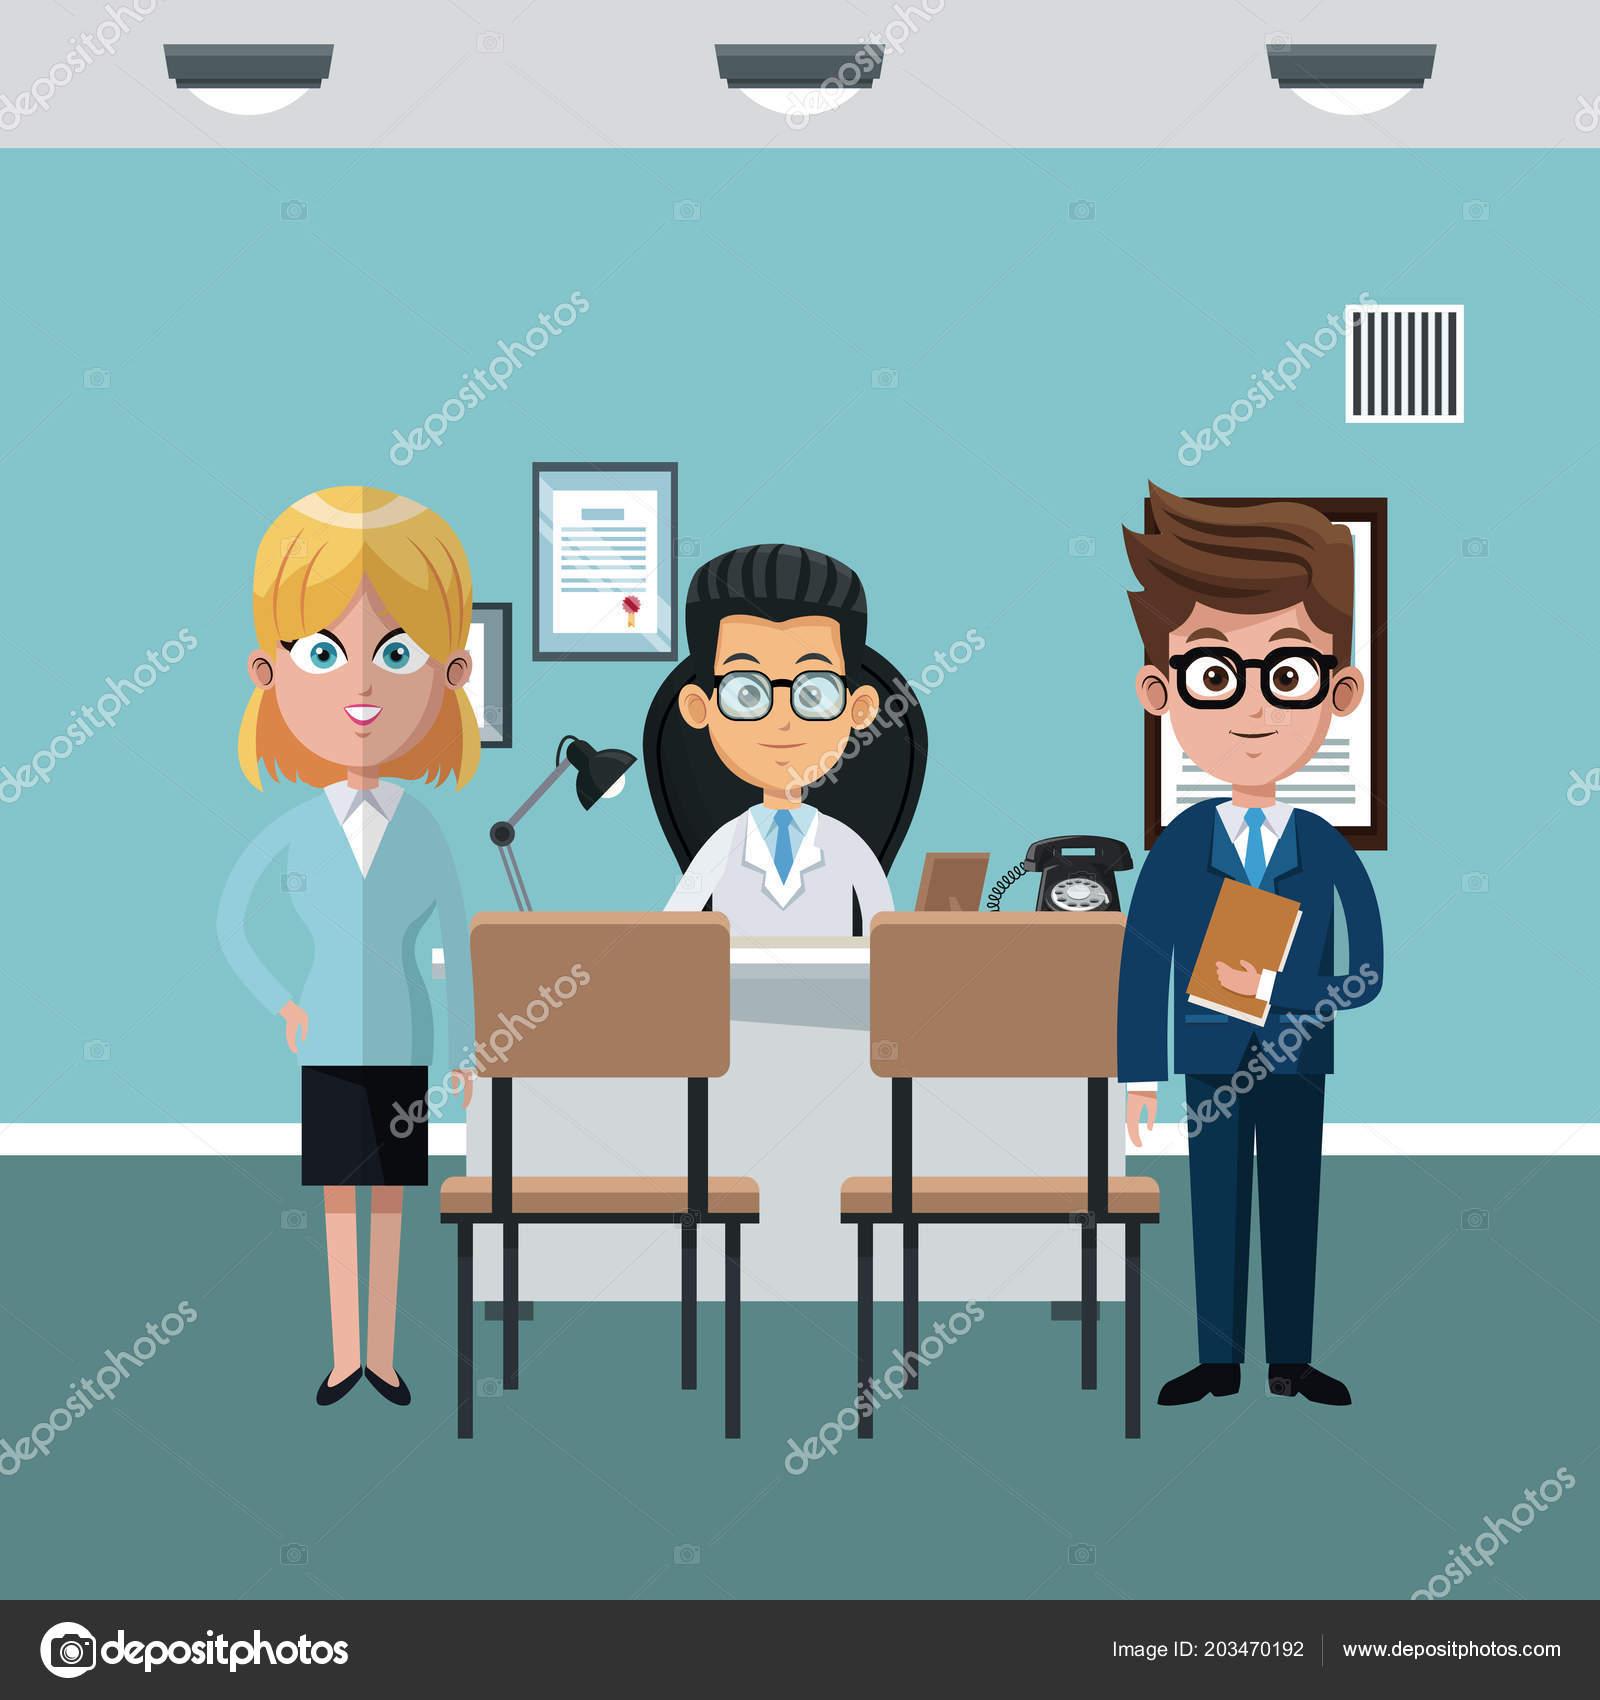 Arzte Buro Cartoon Stockvektor C Jemastock 203470192